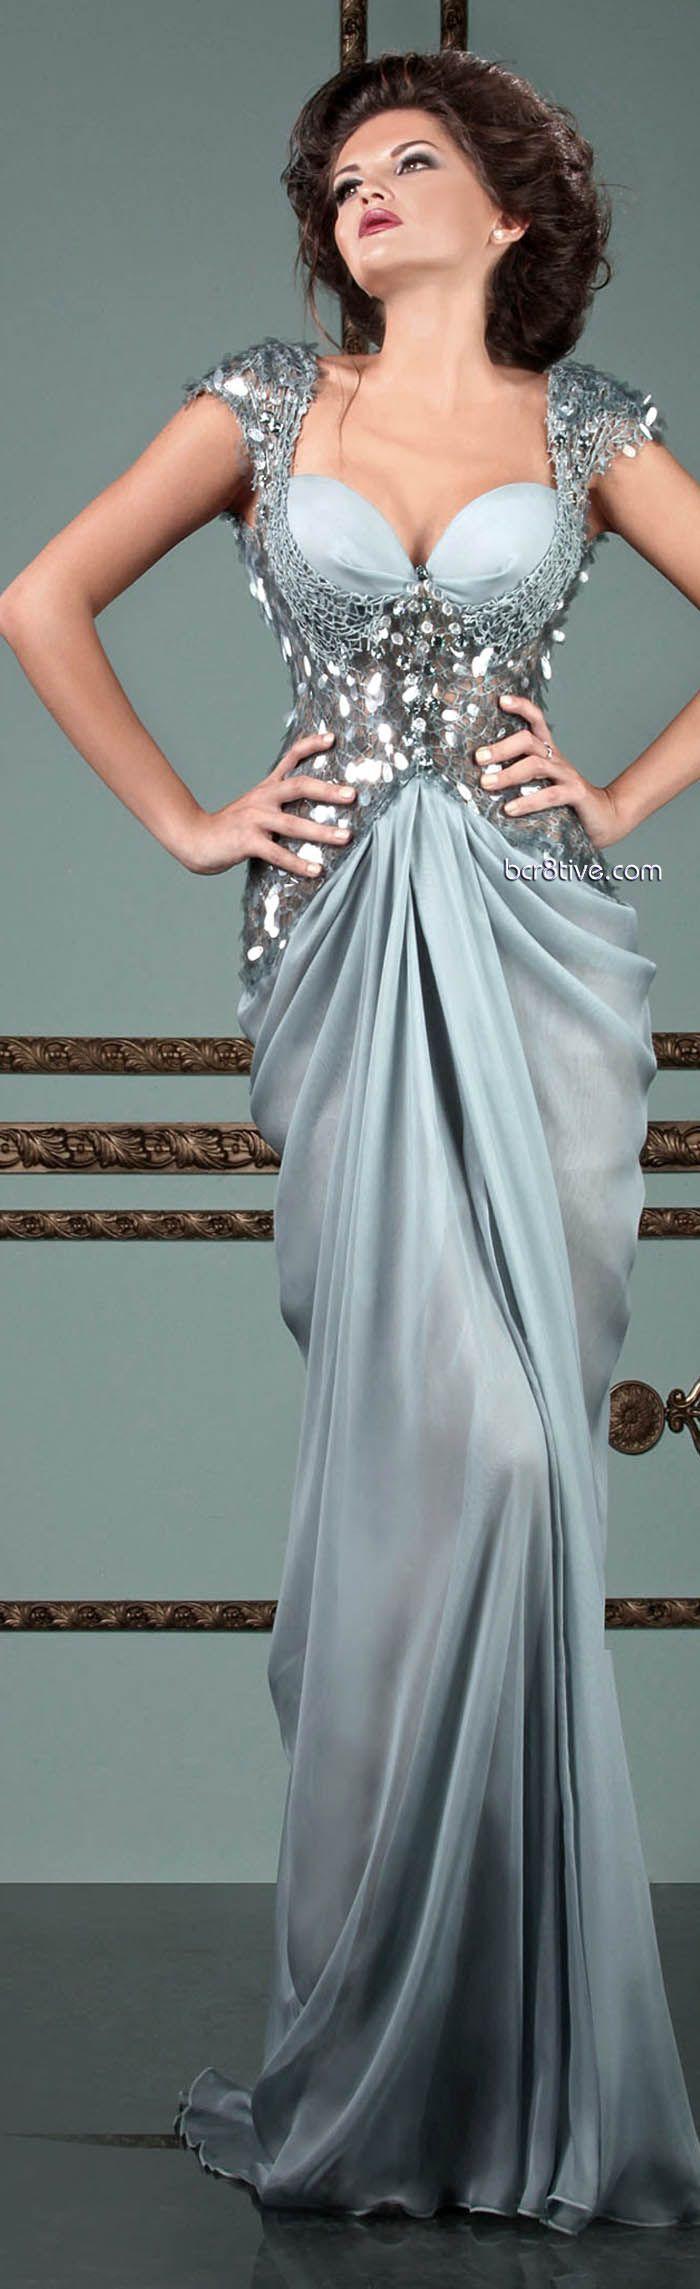 375 best Silver Gray Wedding Inspiration images on Pinterest | Dream ...